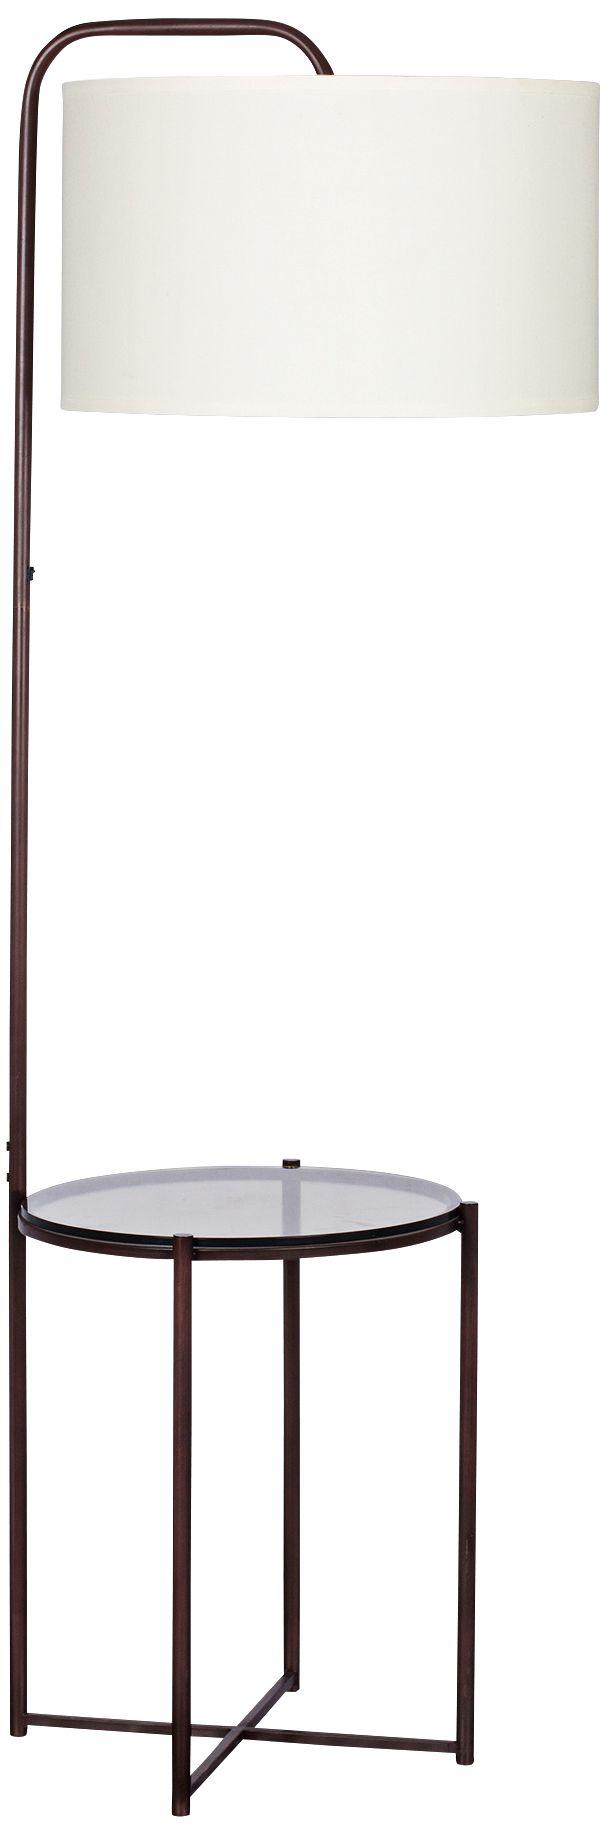 Clement Tempered Smoke Glass With Dark Bronze Floor Lamp